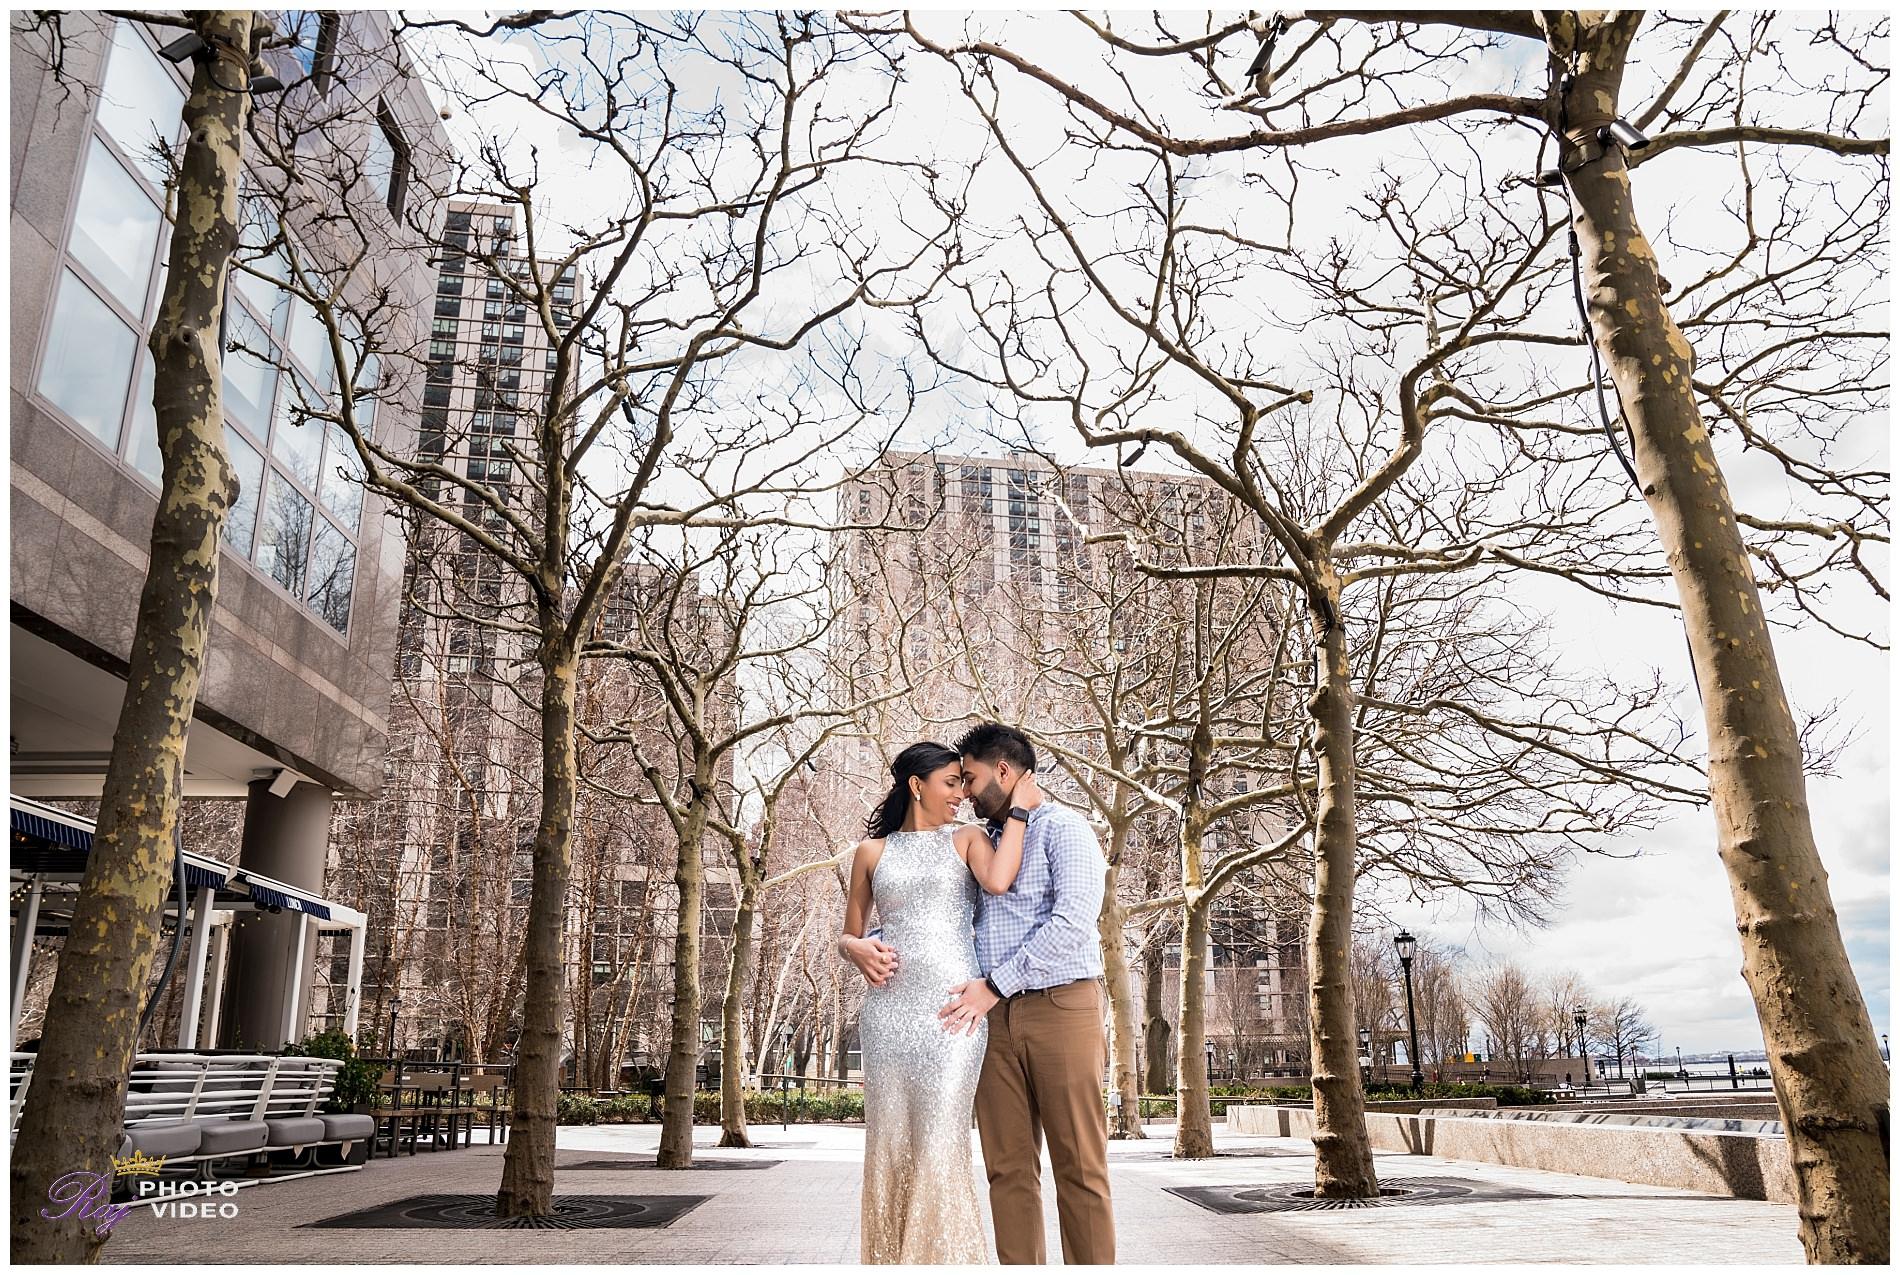 The-Oculus-Brookfield-Place-Downtown-Manhattan-Engagement-Shoot-Nidhi-Rudra-00015.jpg